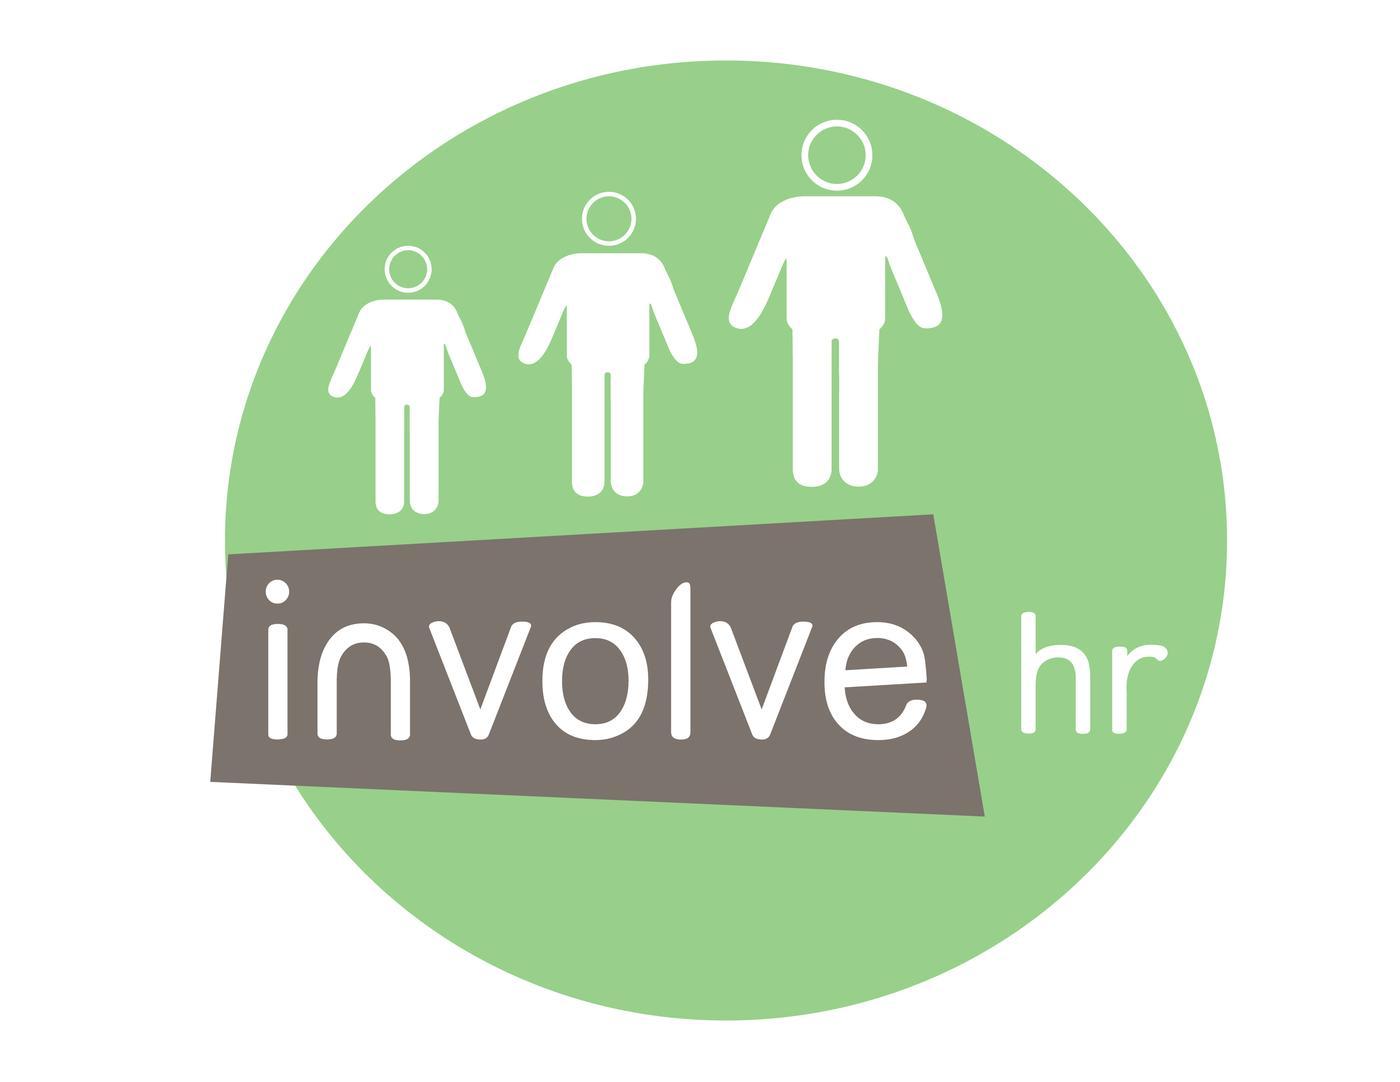 INVOLVE HR